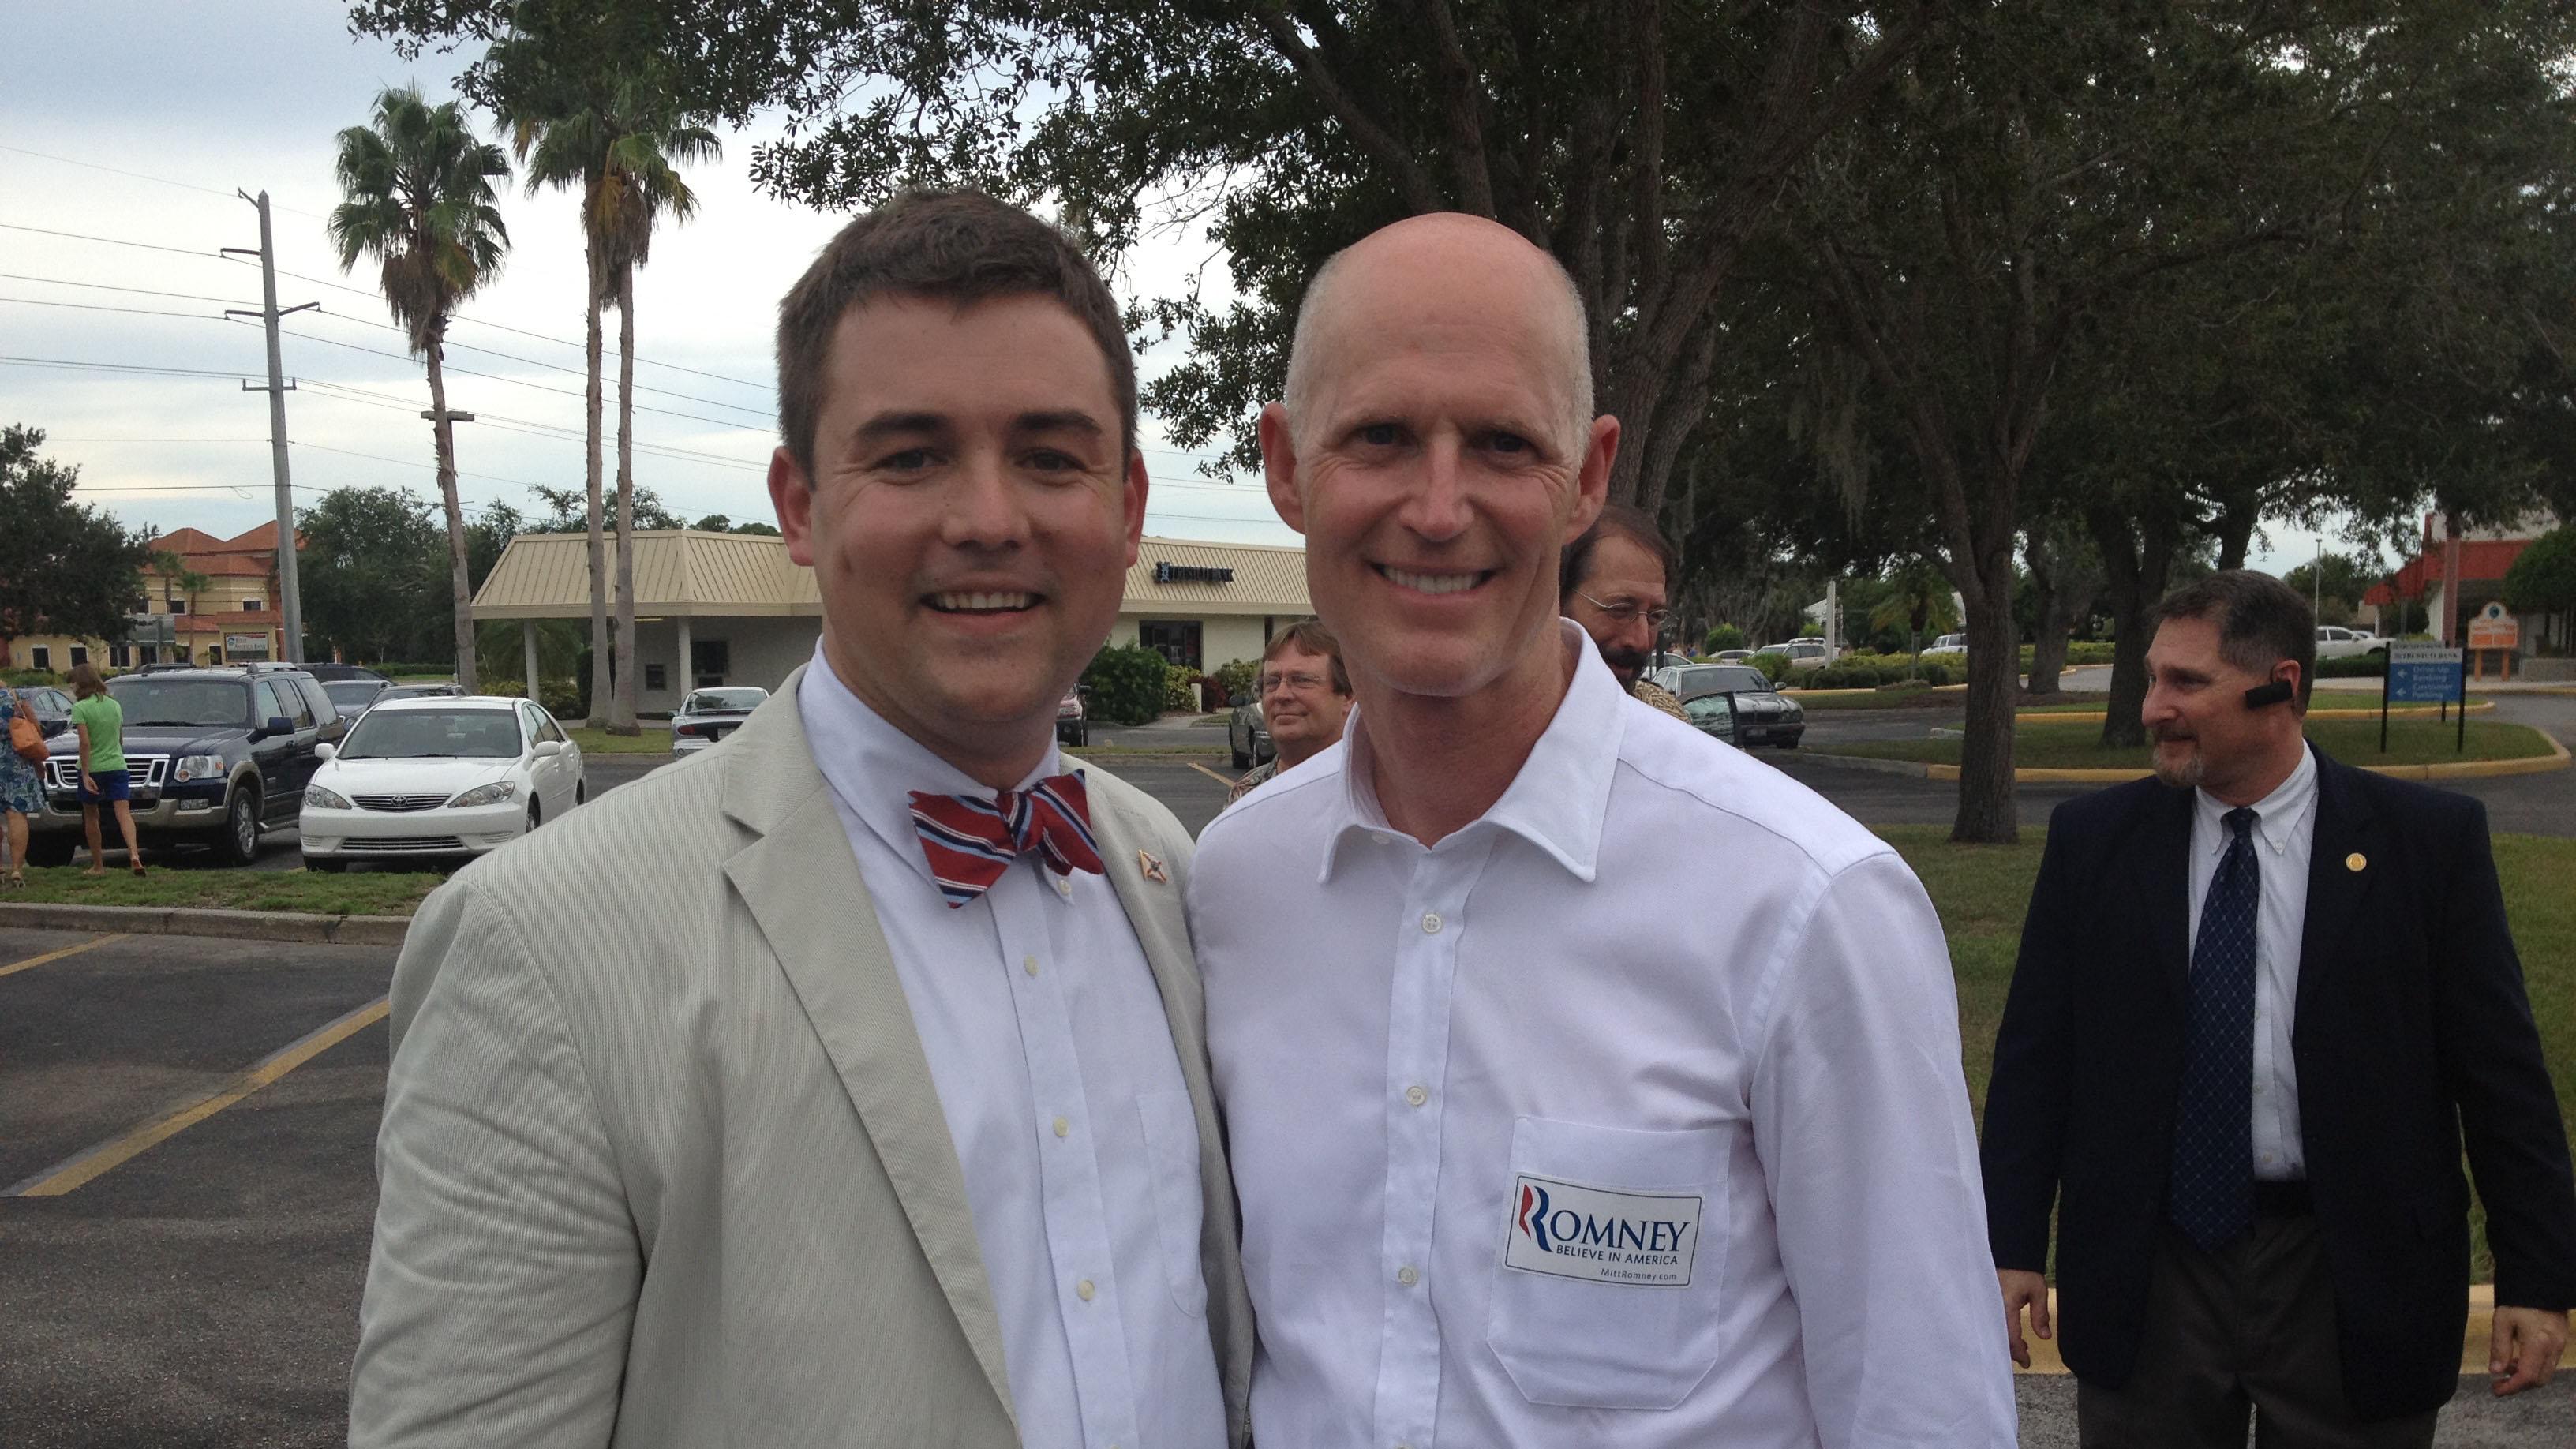 Christian Ziegler with Rick Scott